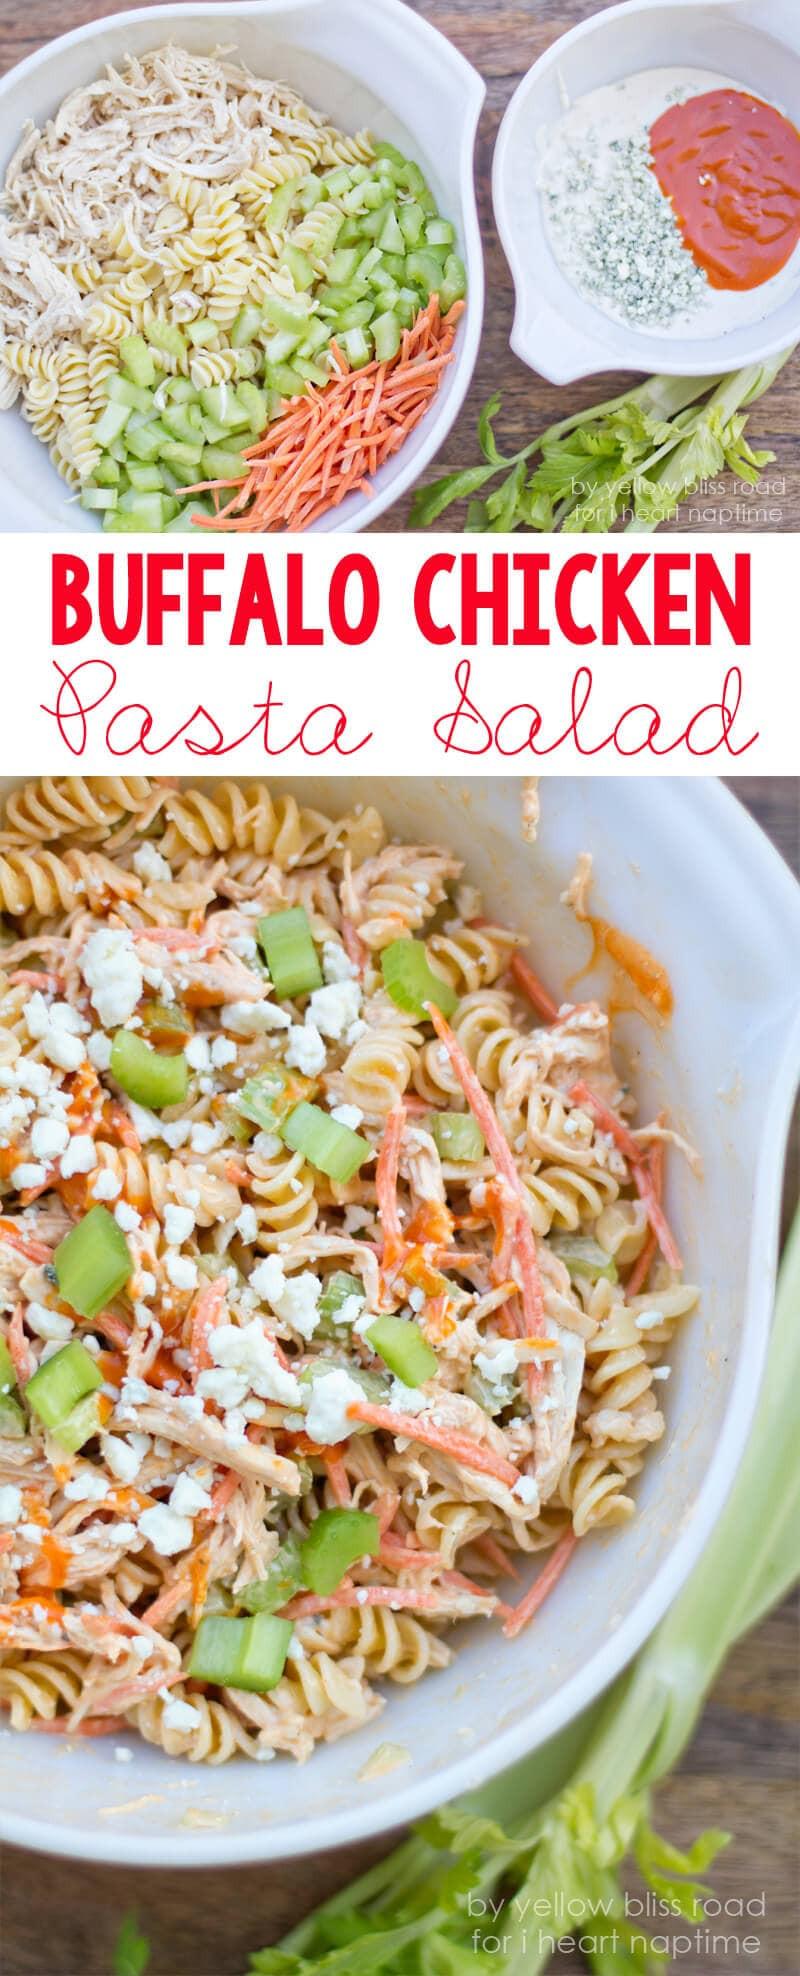 Buffalo Chicken Recipes Healthy  healthy buffalo chicken pasta salad